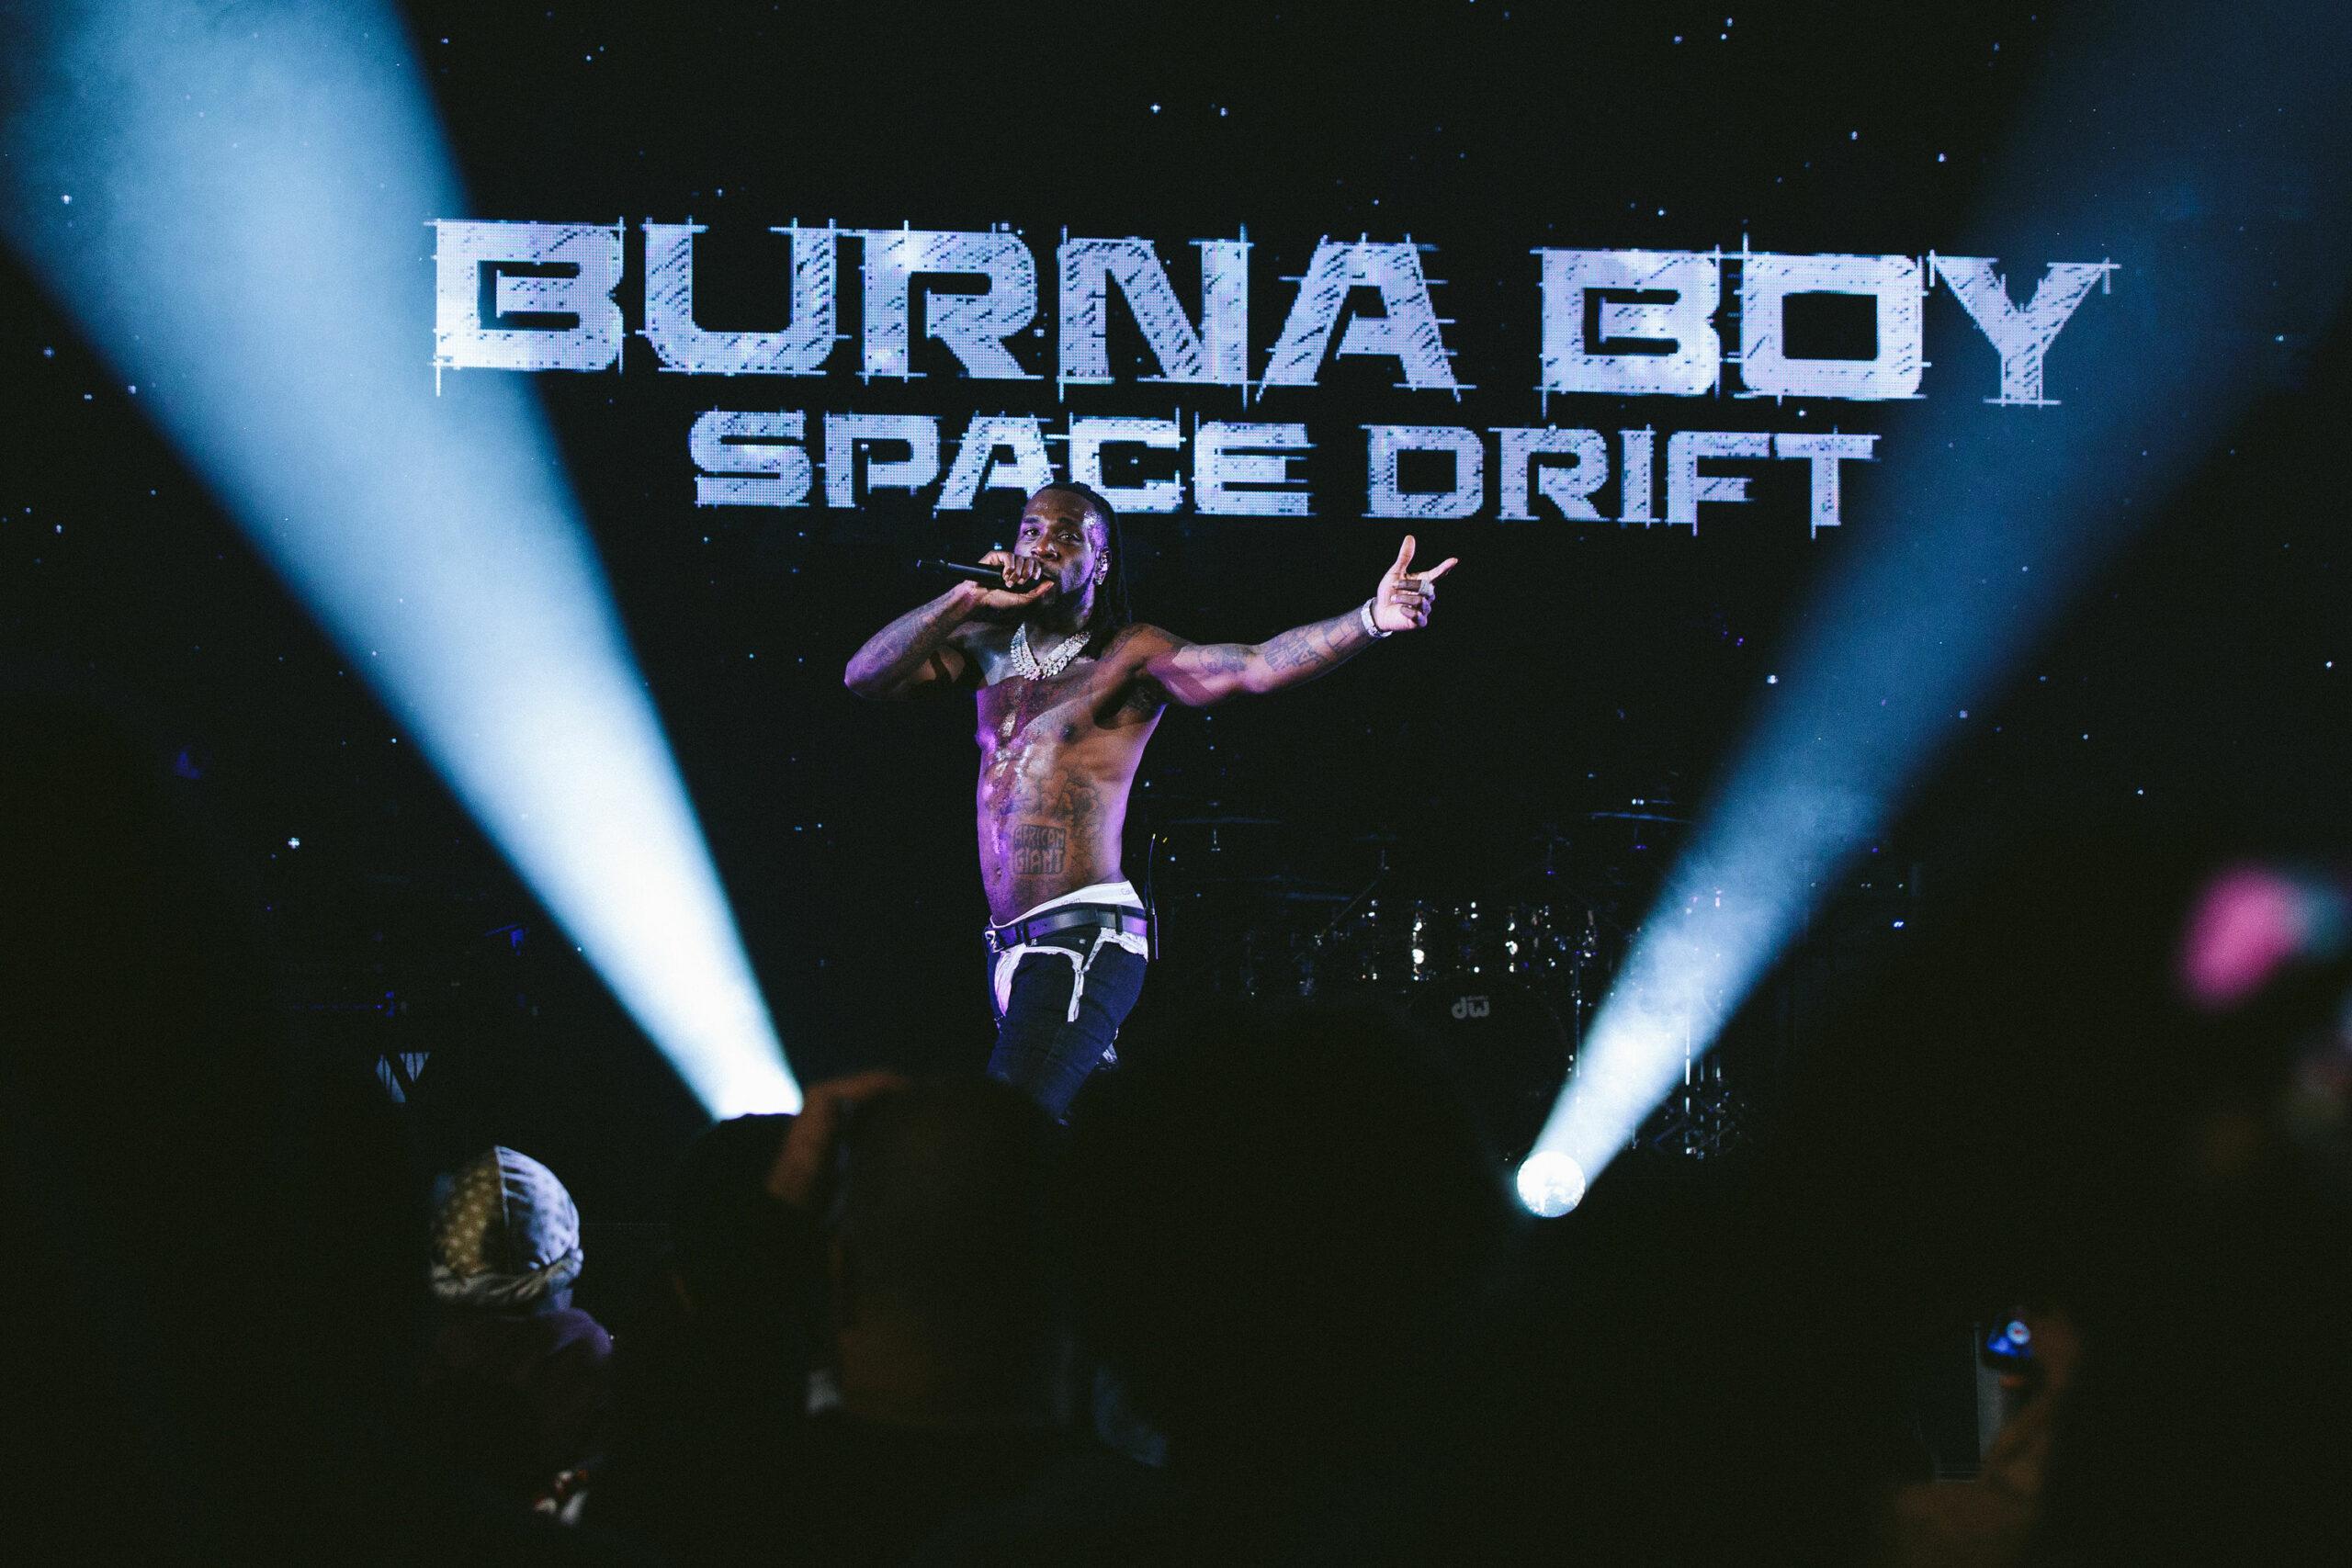 Burna Boy Space Drift From - Burna Boy Voice